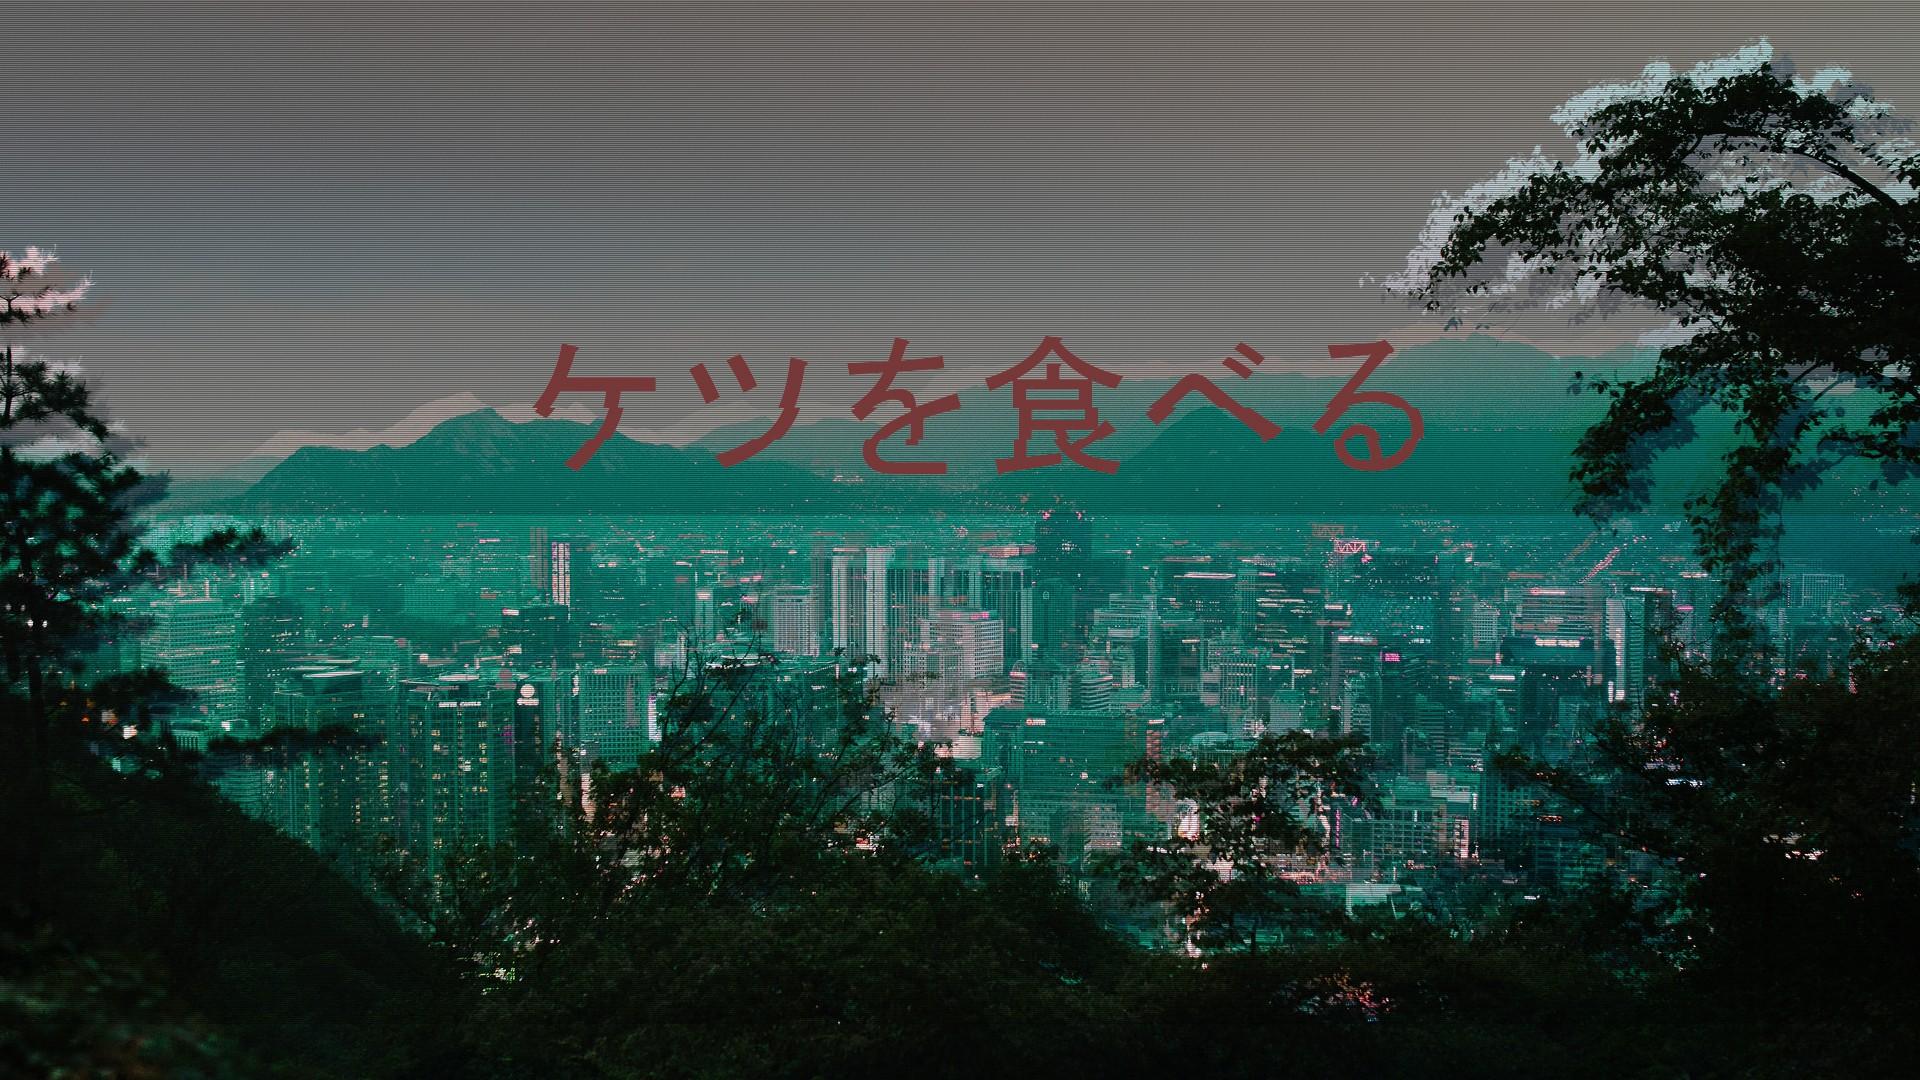 Sfondi photoshop notte 3d riflessione glitch art for Progettazione 3d gratis